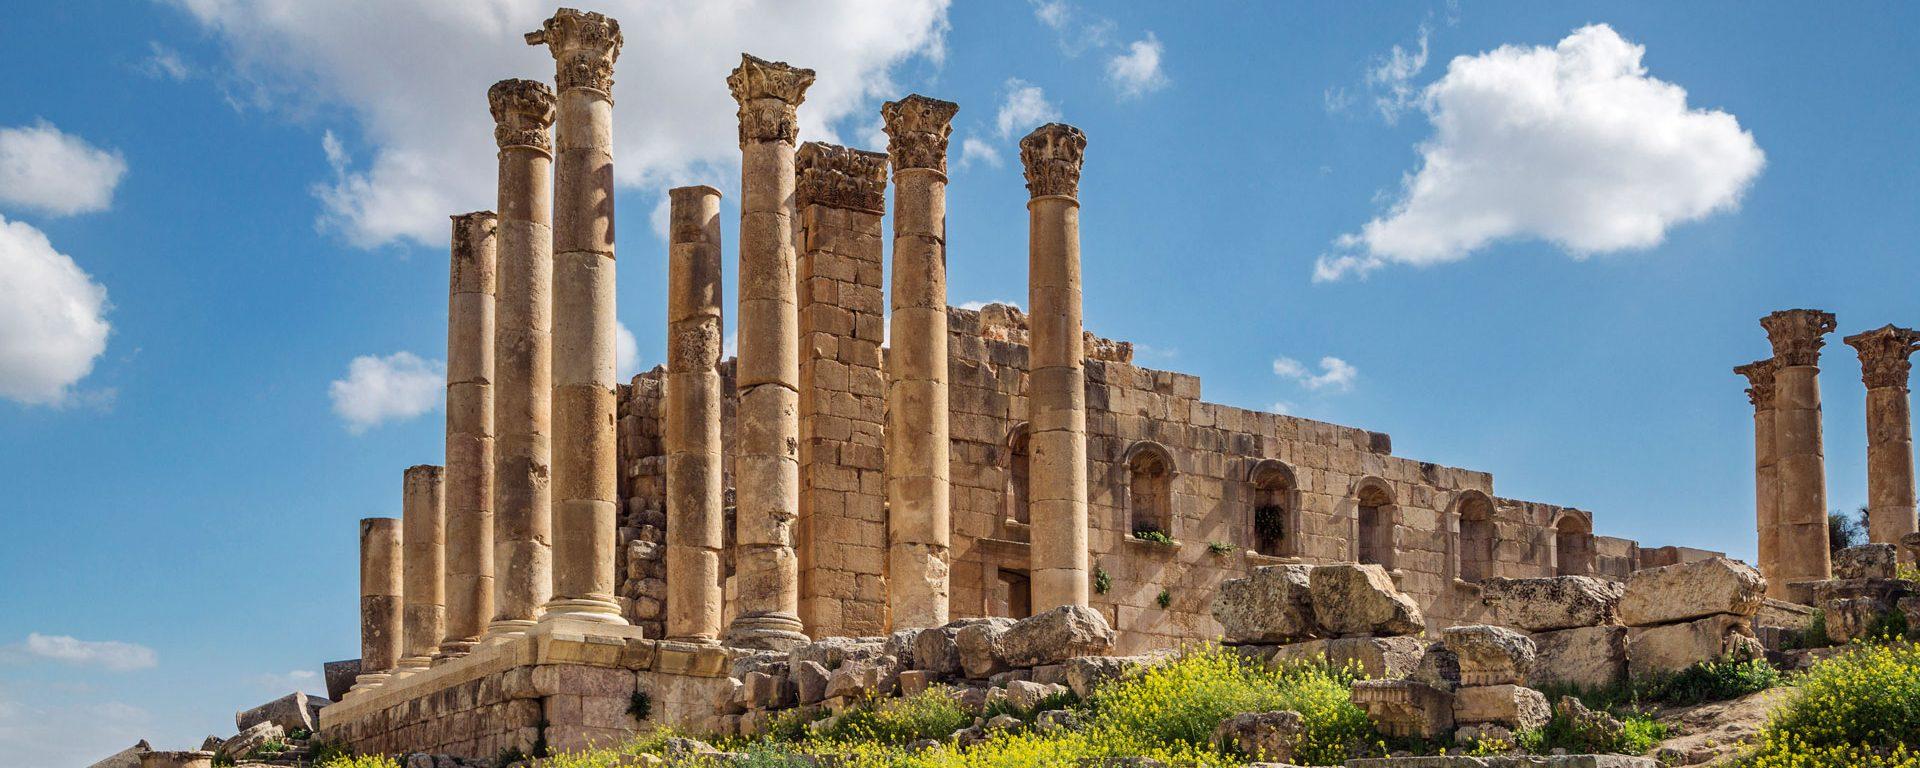 The ruins of the Great Temple of Zeus, Jerash, Jordan